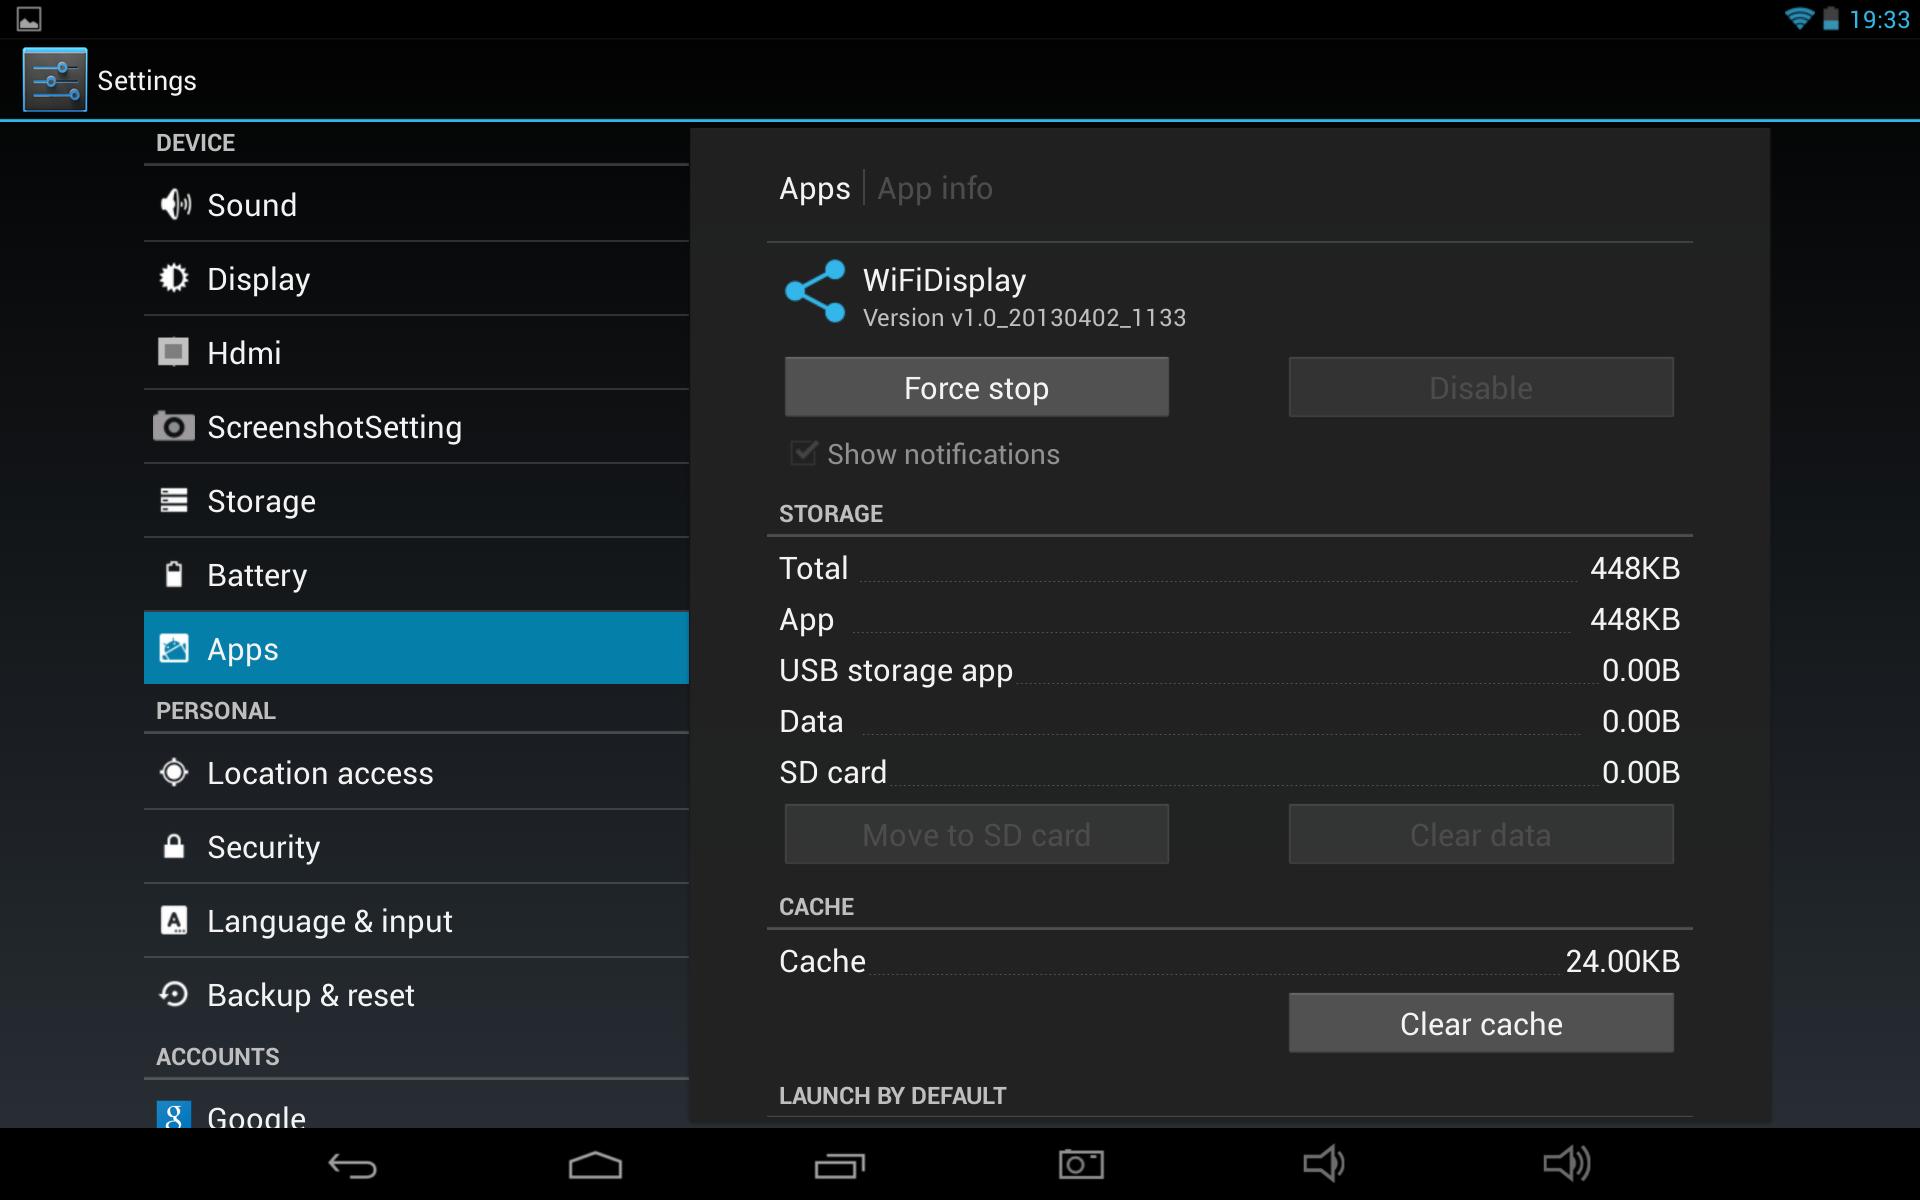 Screenshot_2013-10-20-19-33-34.png